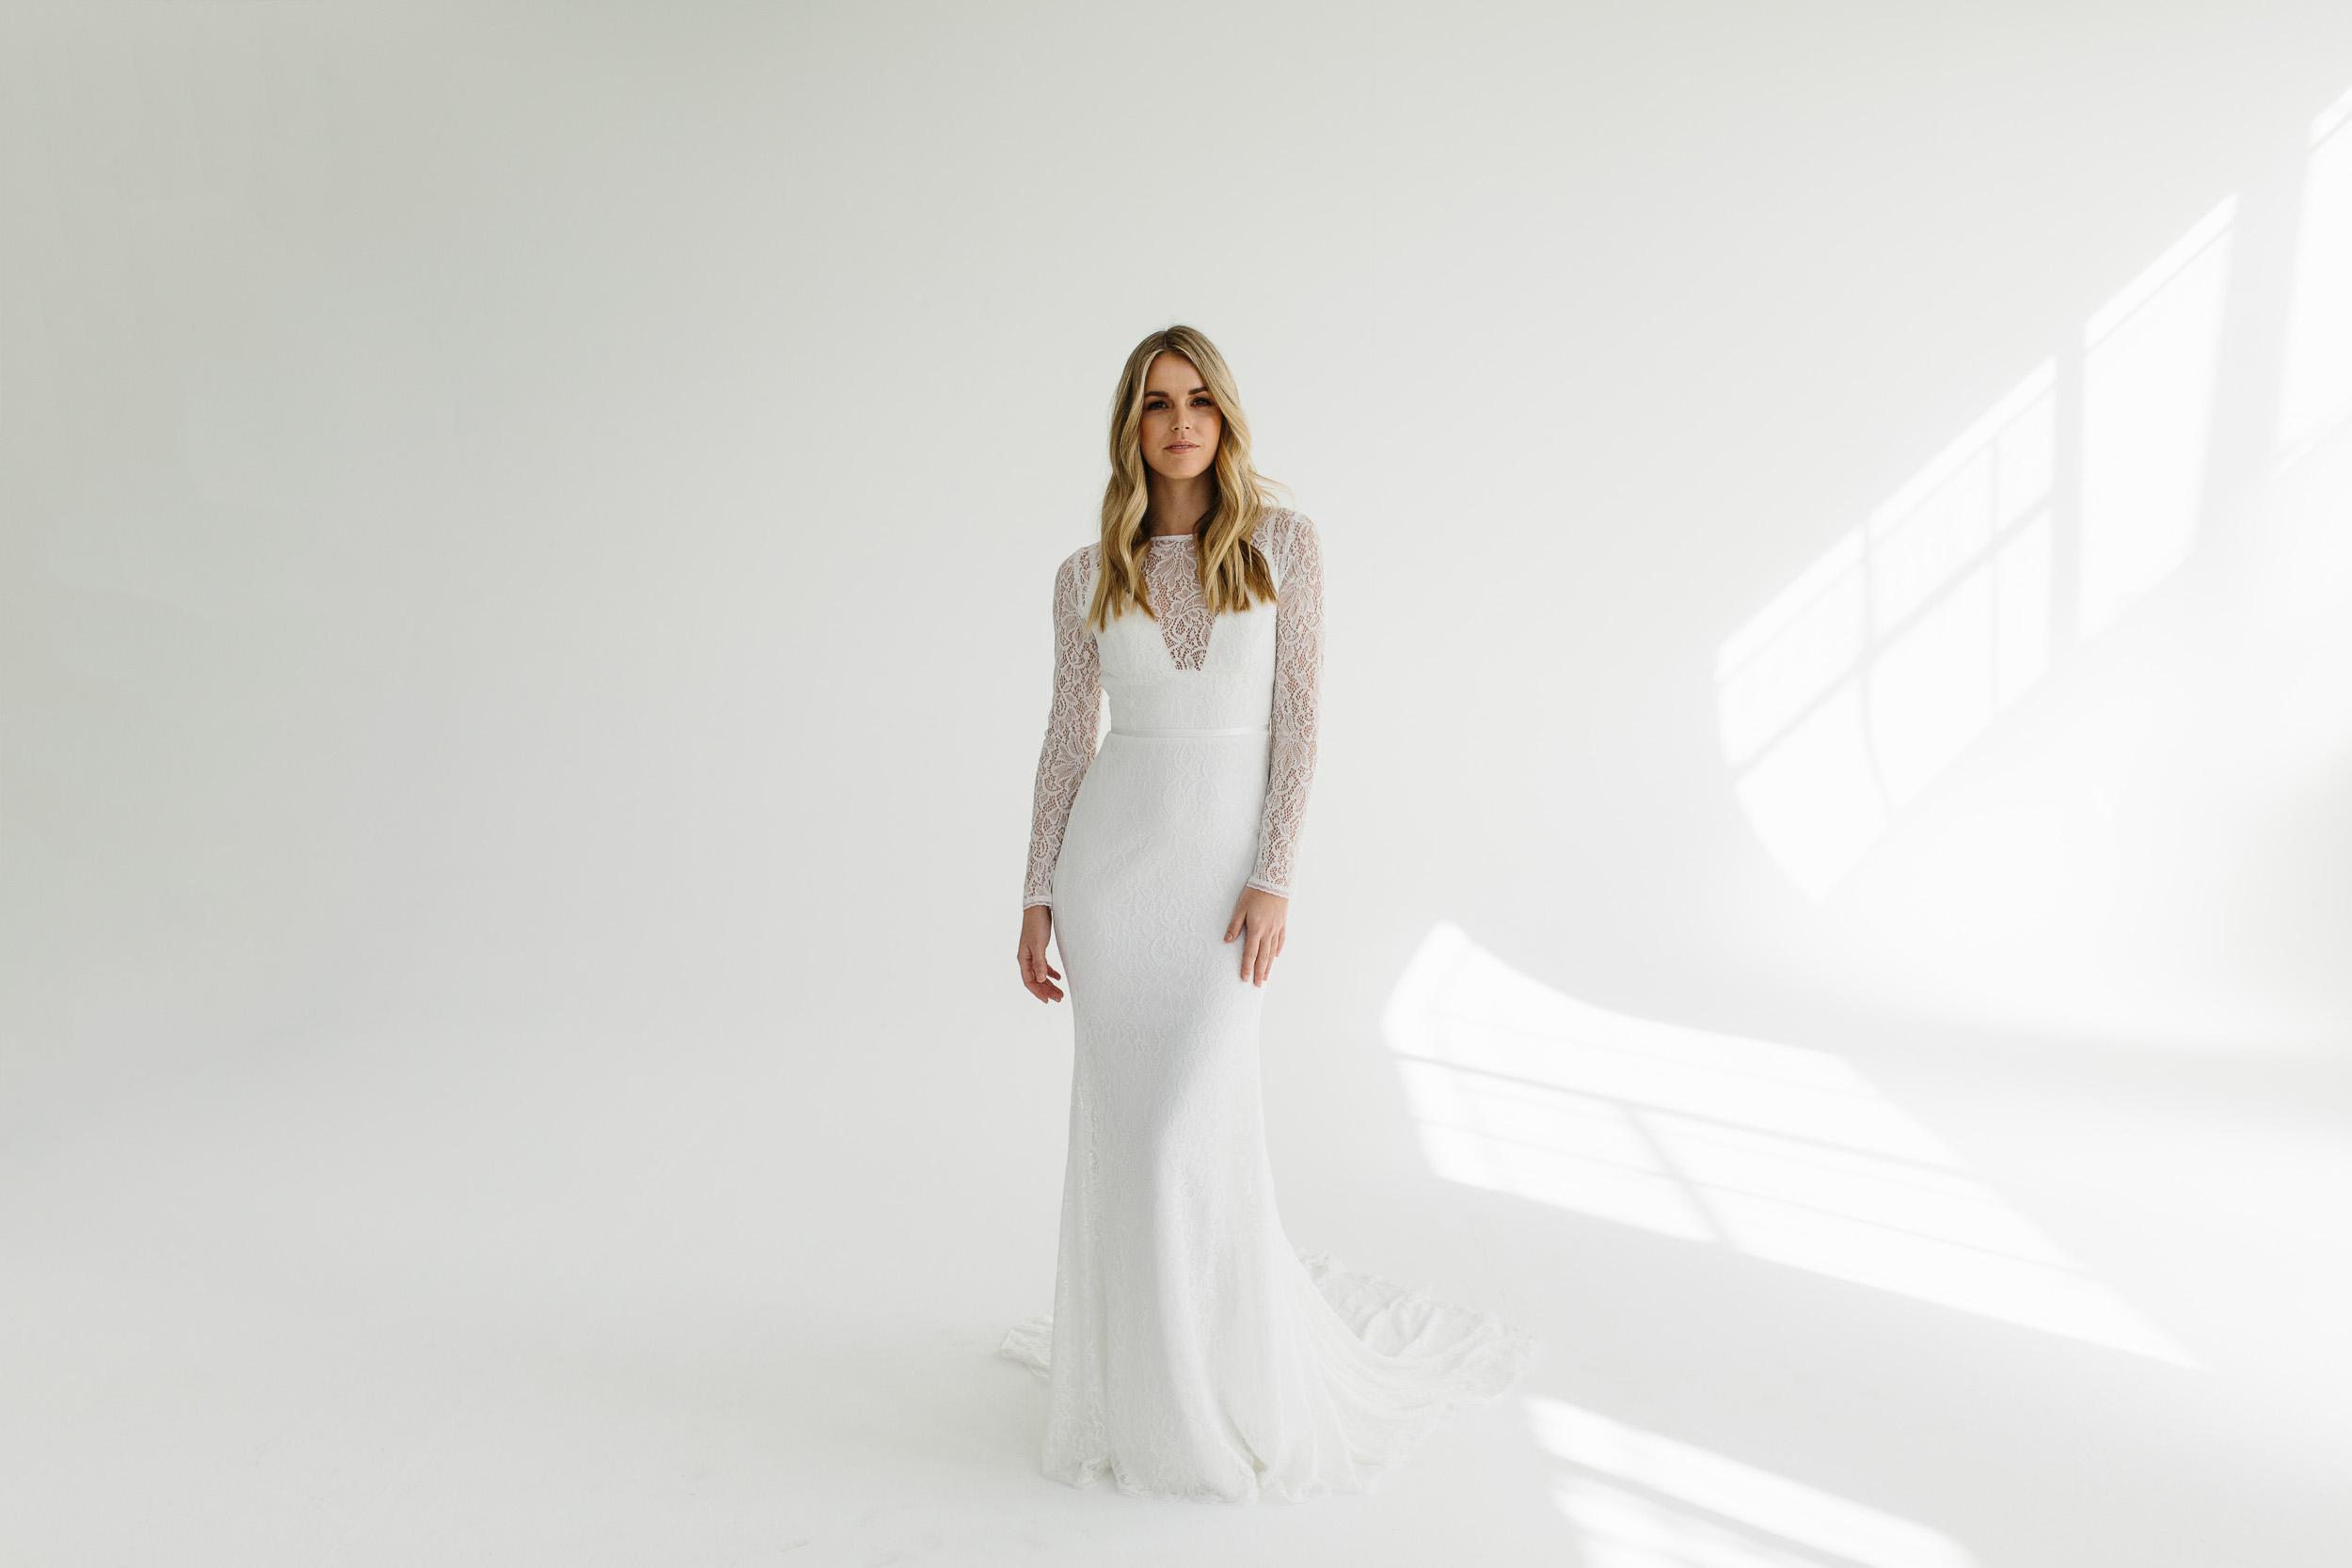 Kas-Richards-Karen-Willis_Holmes-Bridal-Wild-Hearts-Collection-38.jpg